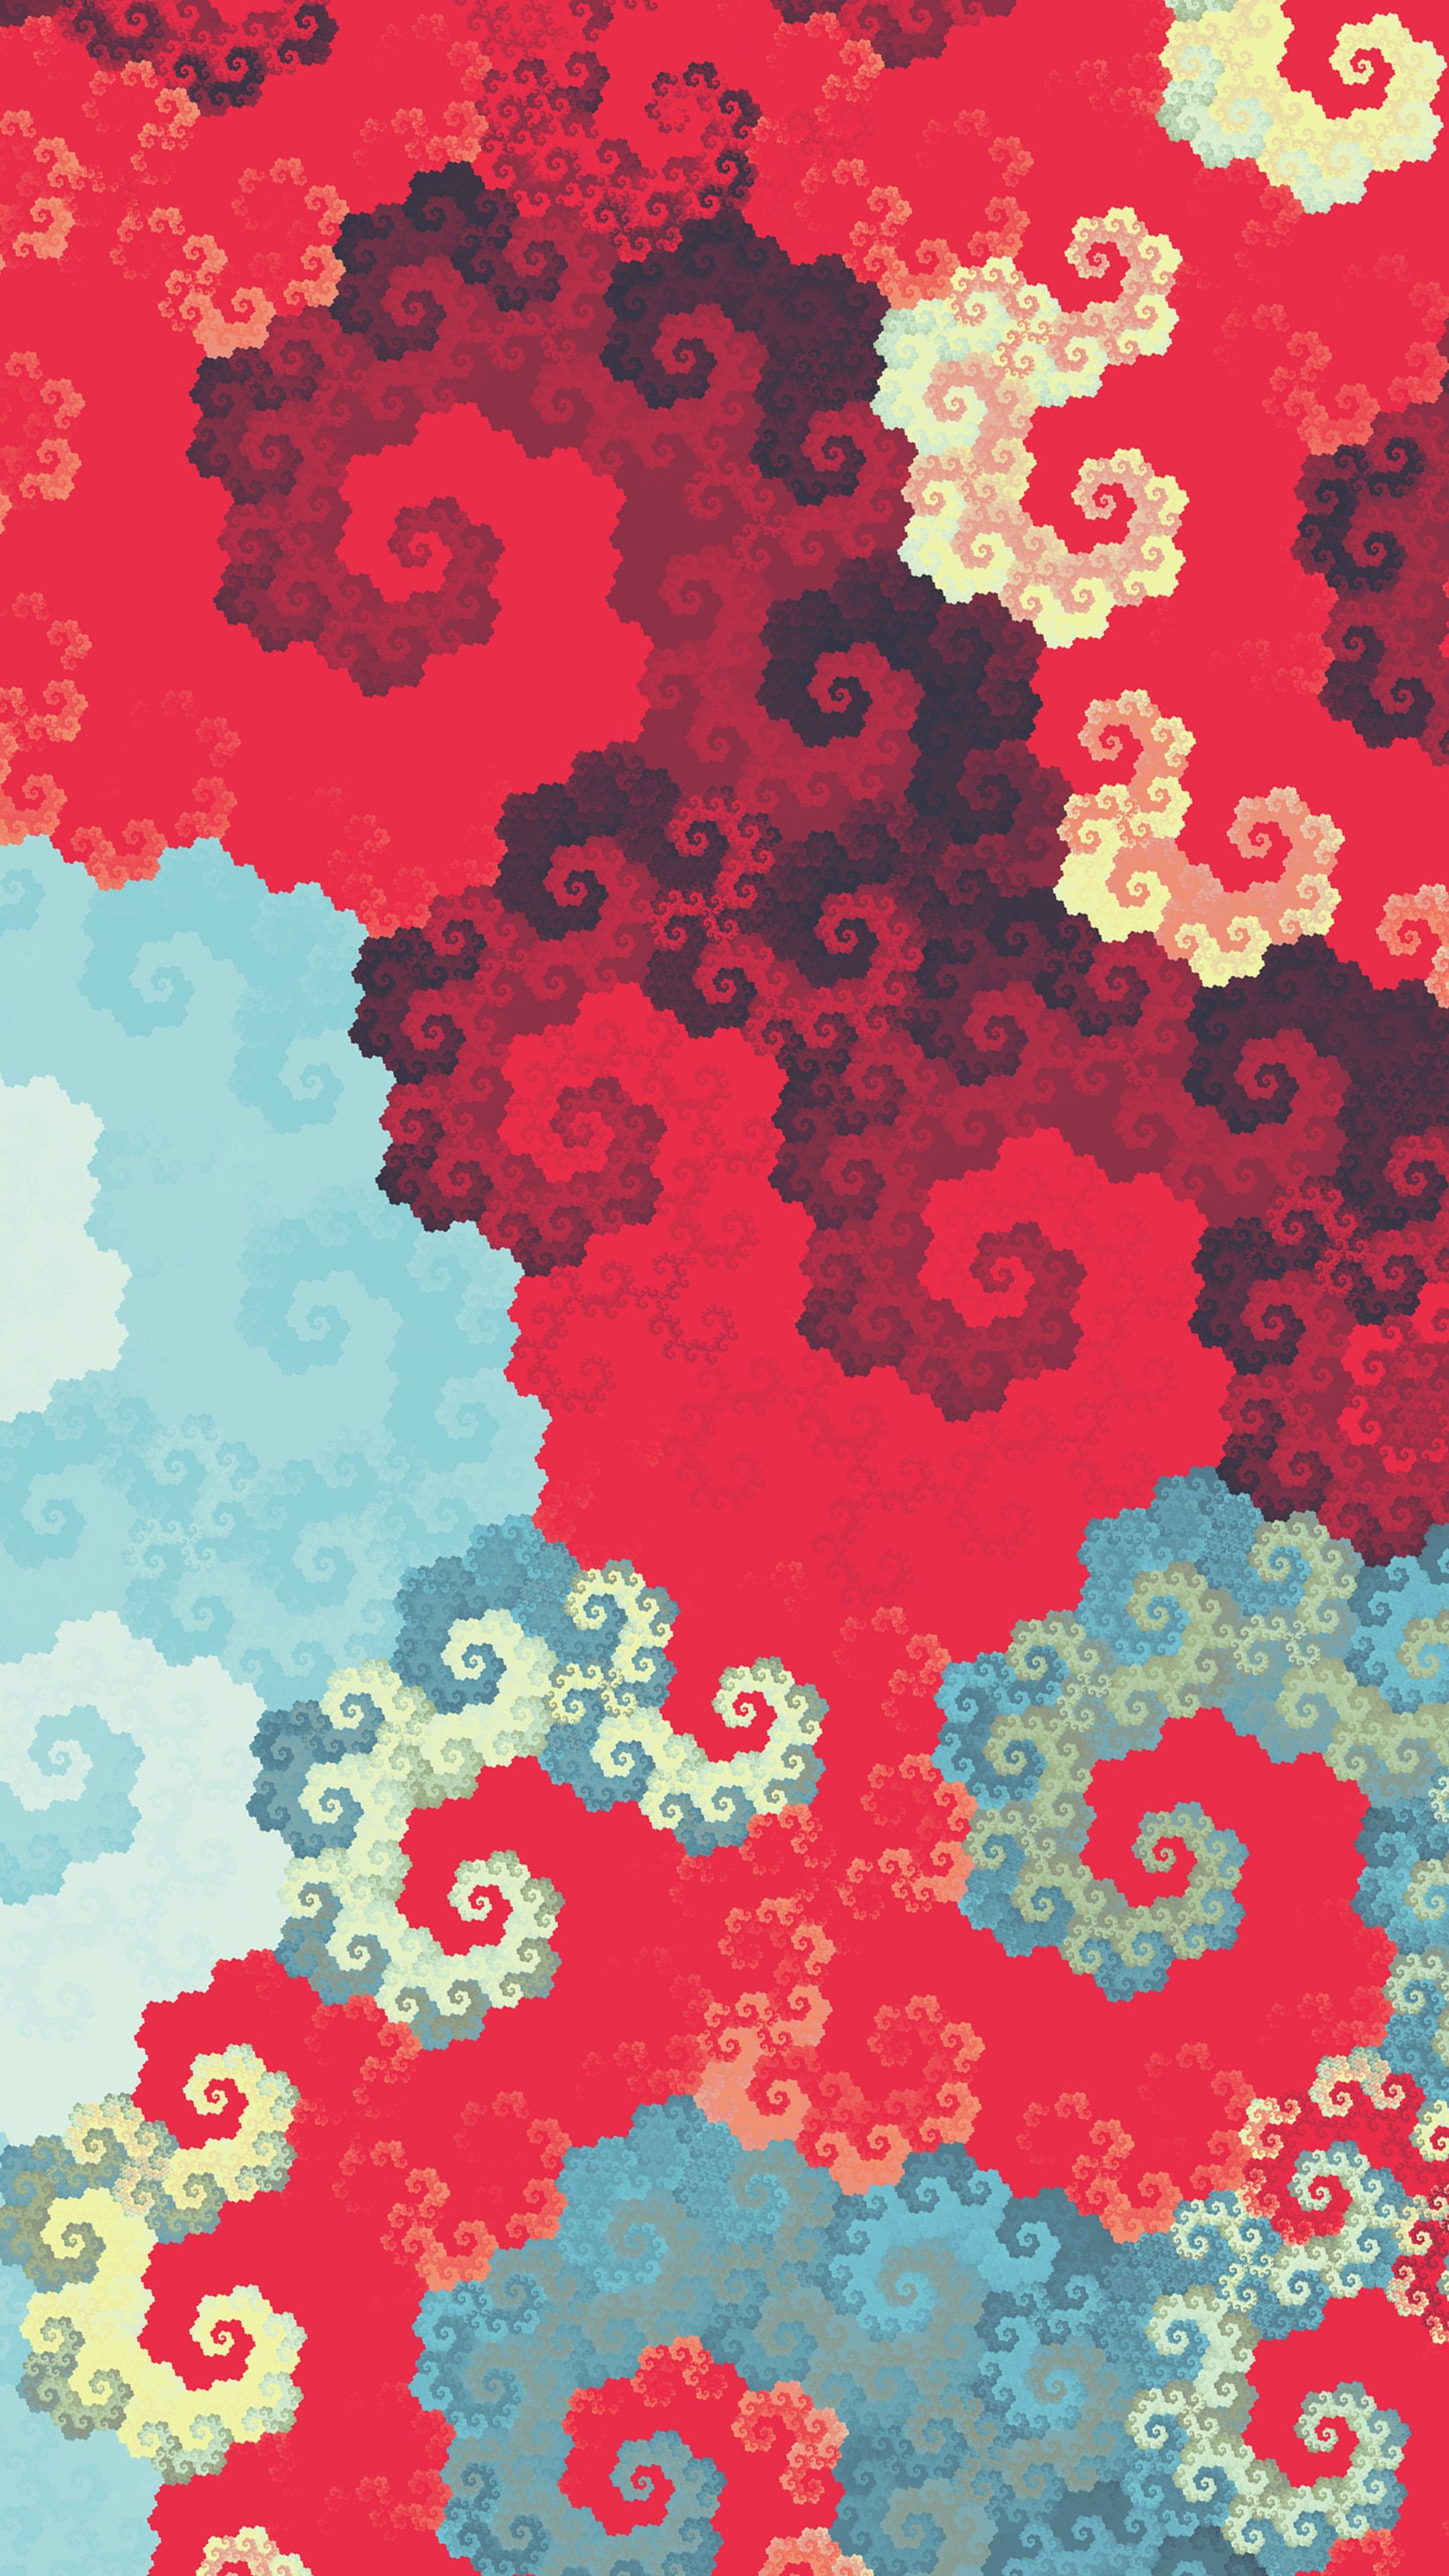 Clouds digital fractal art ua wallpaper 2160x3840 - Art wallpaper 2160x3840 ...